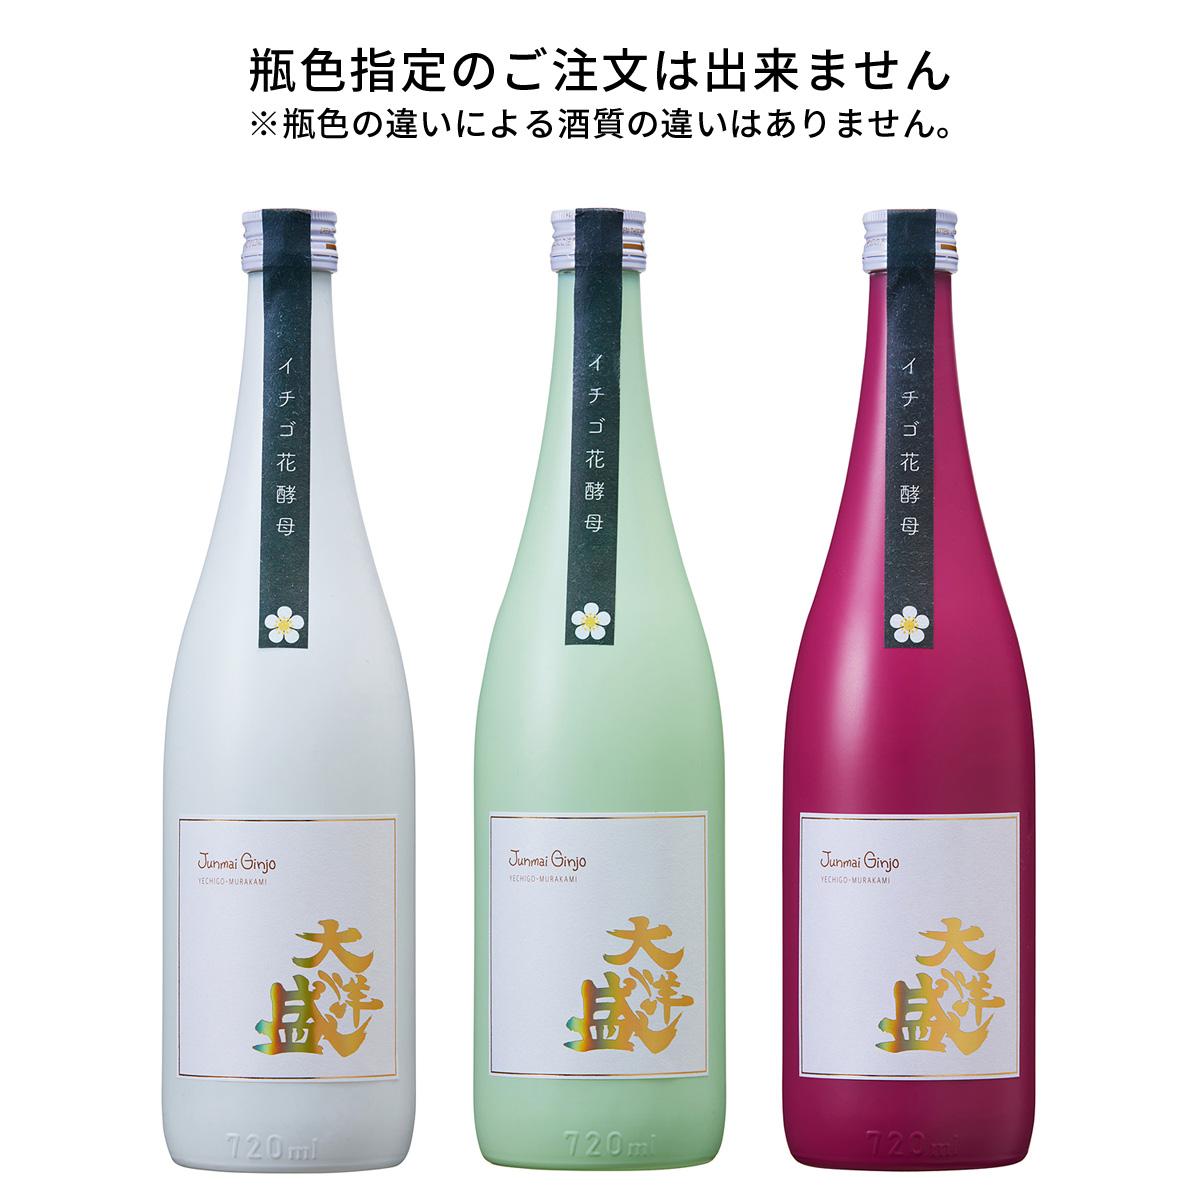 日本酒 イチゴ花酵母 純米吟醸 大洋盛 720ml